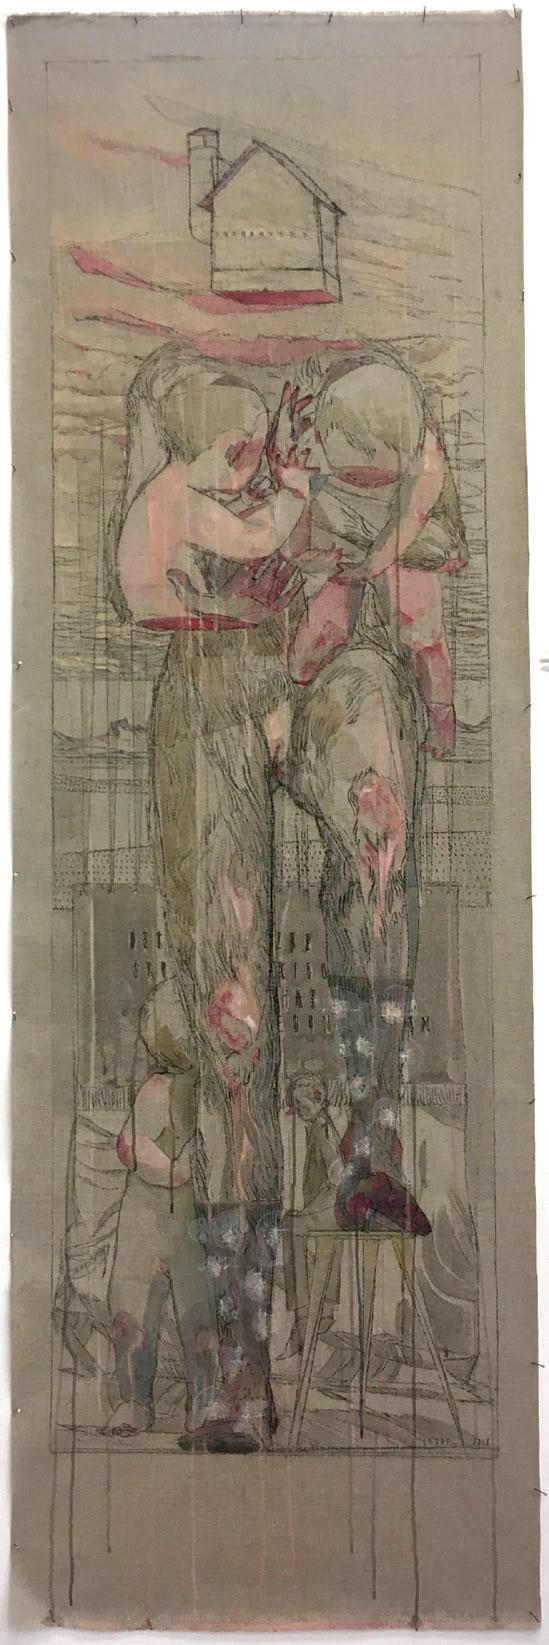 Maria Legat | ohne Titel | 218x70cm | Art Austia 2019 | Galerie3